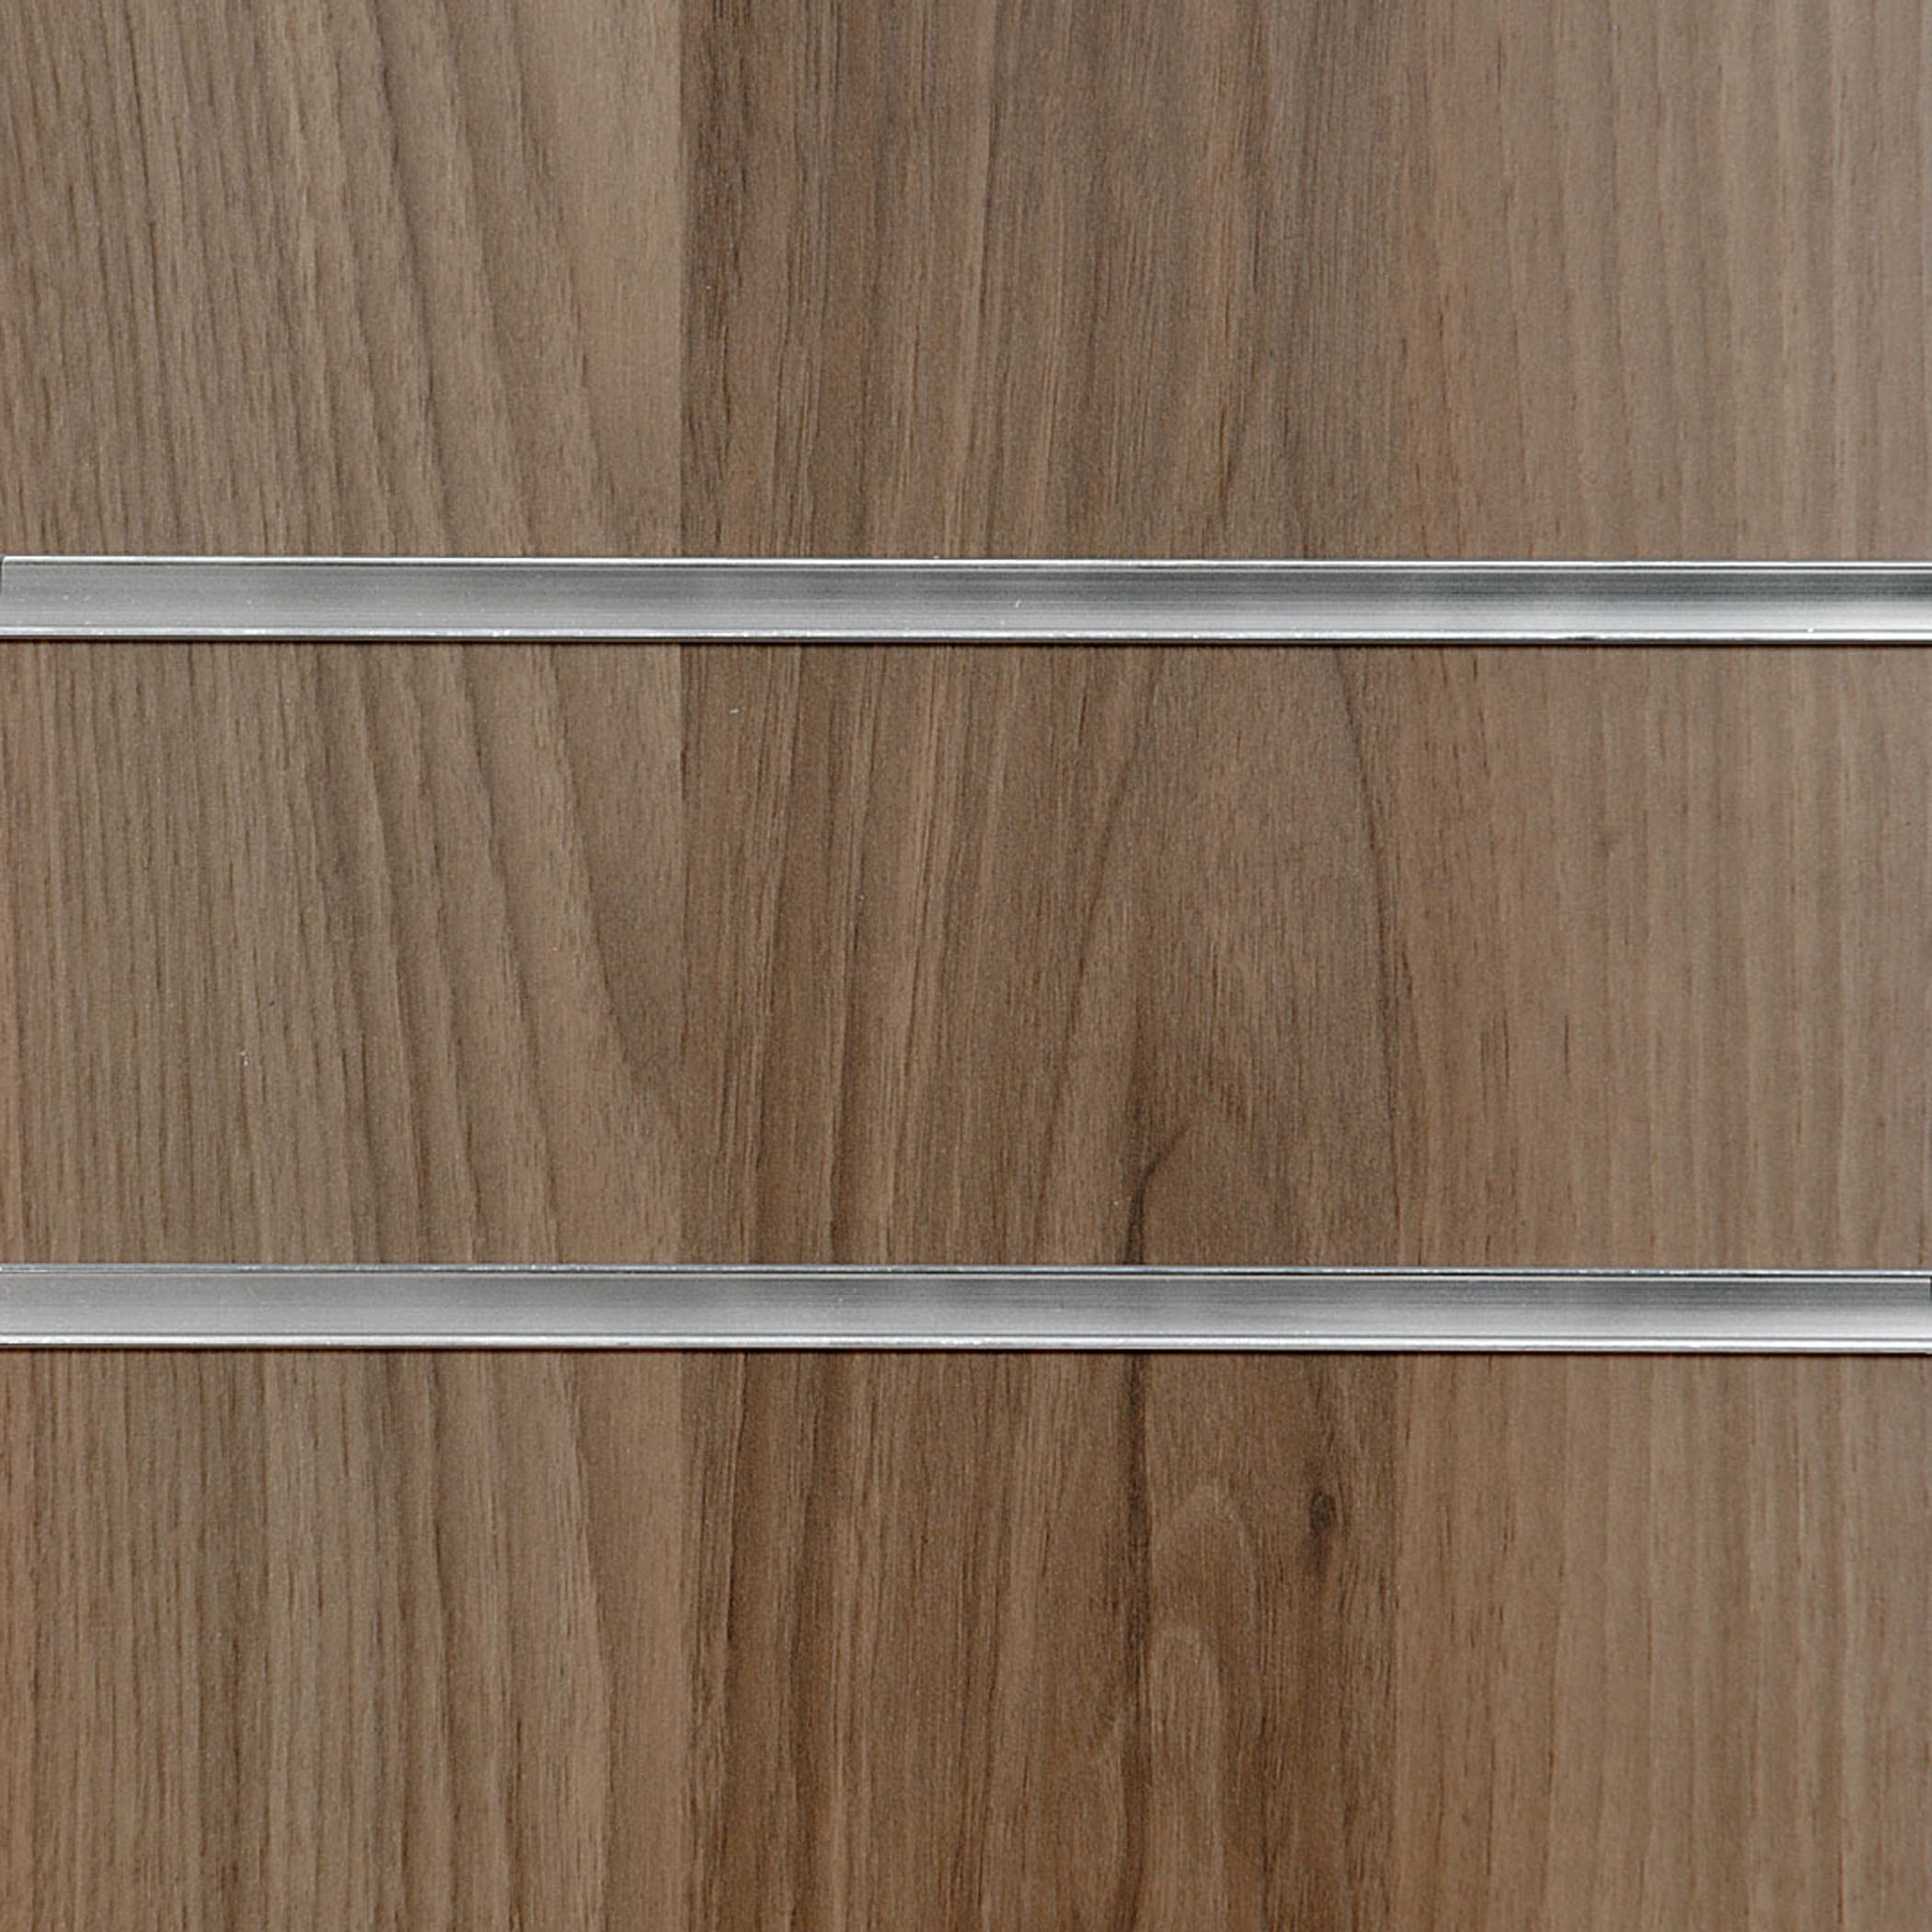 Light Walnut Uk Slatwall Panel 8ft X 4ft 2400mm X 1200mm